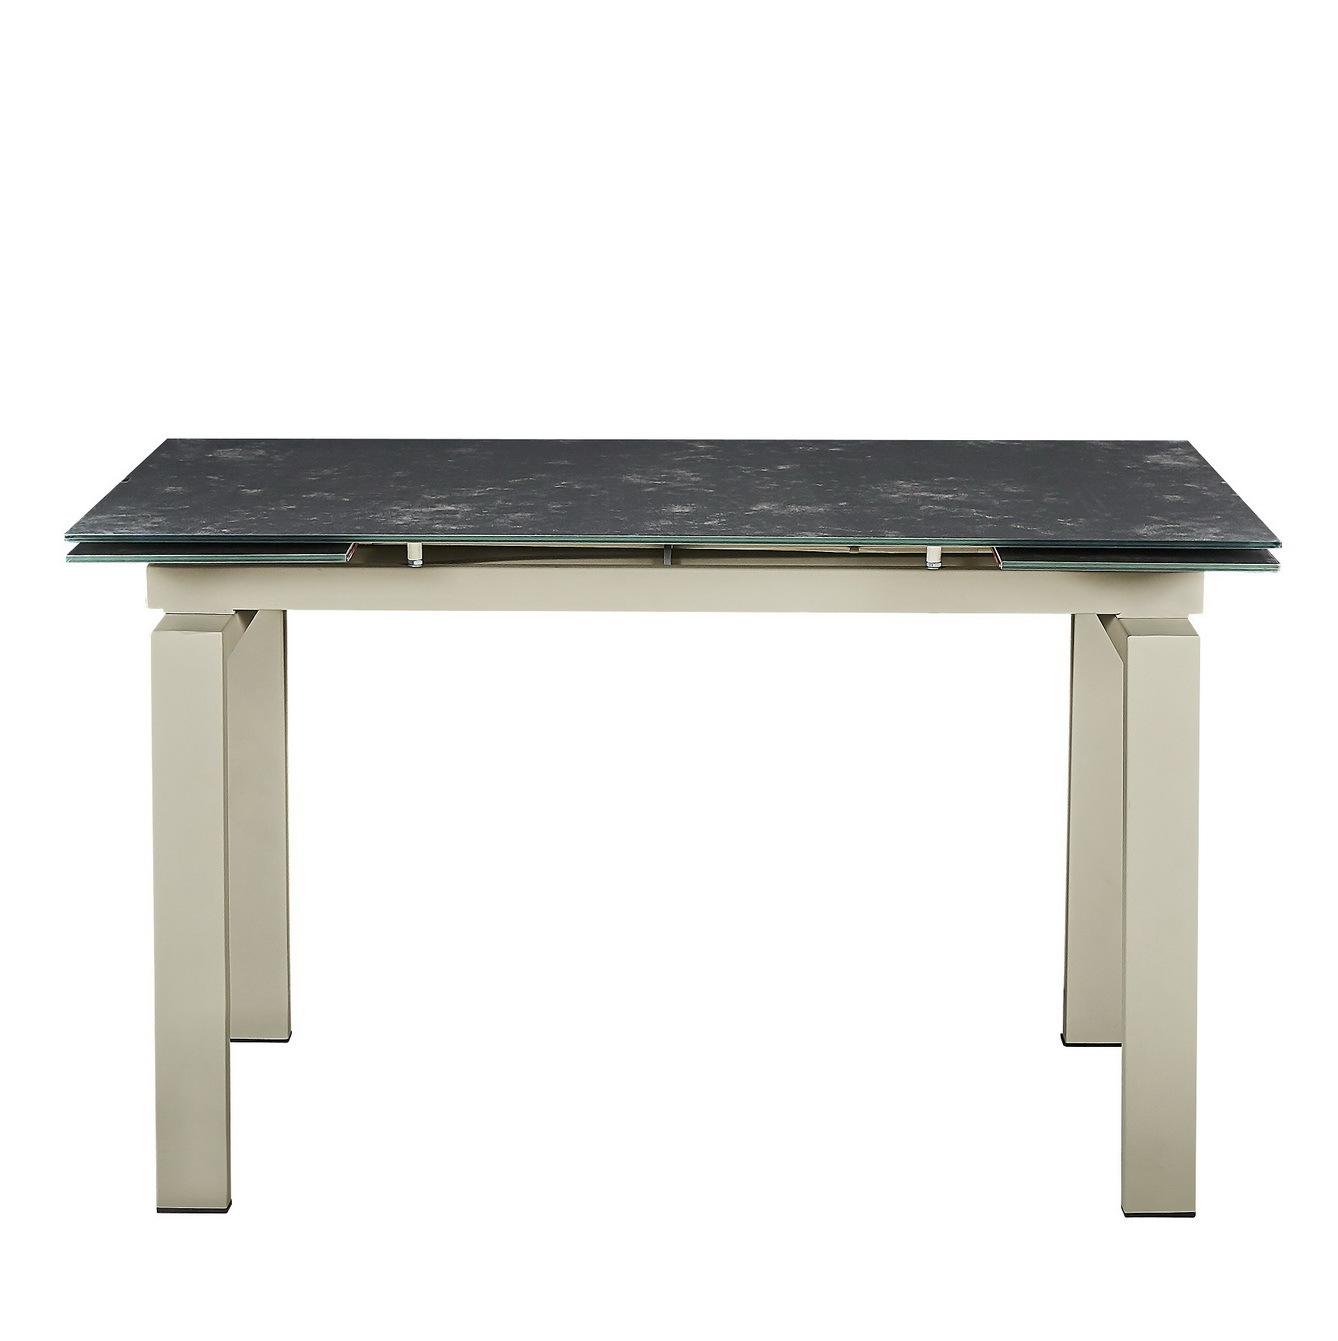 Стол обеденный PORT (130) BROWN/LATTE (коричневый/латте)